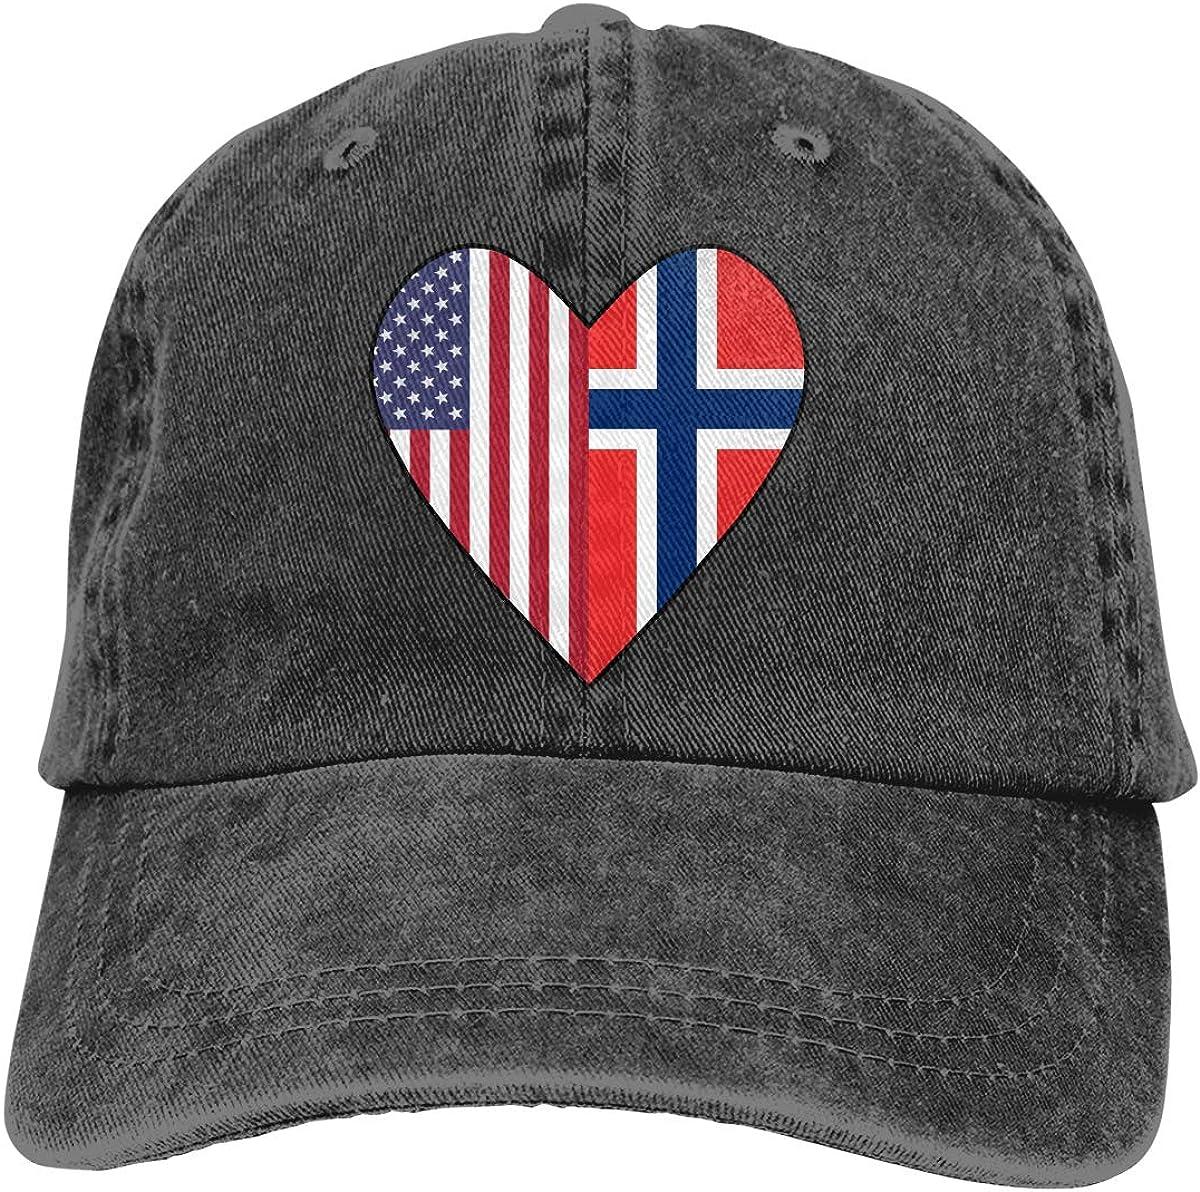 Half Norway Flag Half USA Flag Love Heart Unisex Personalize Denim Casquette Adjustable Baseball Cap